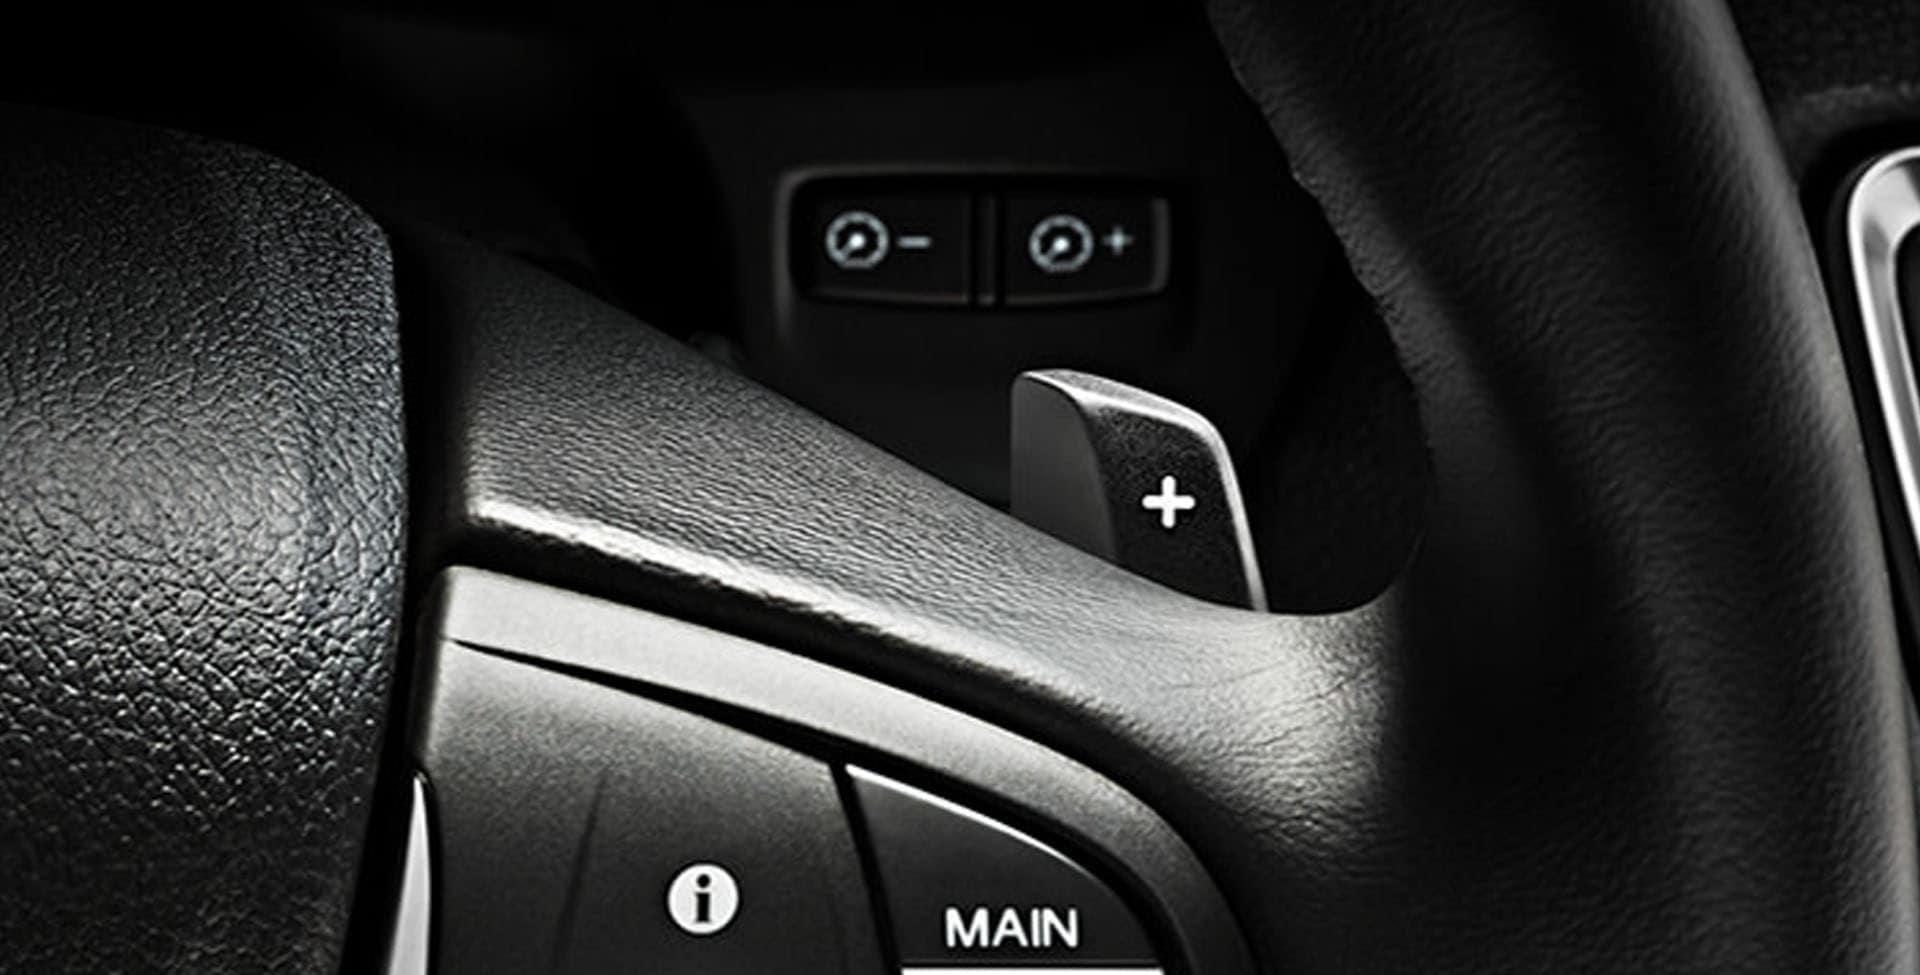 Acura MDX 9-speed shift